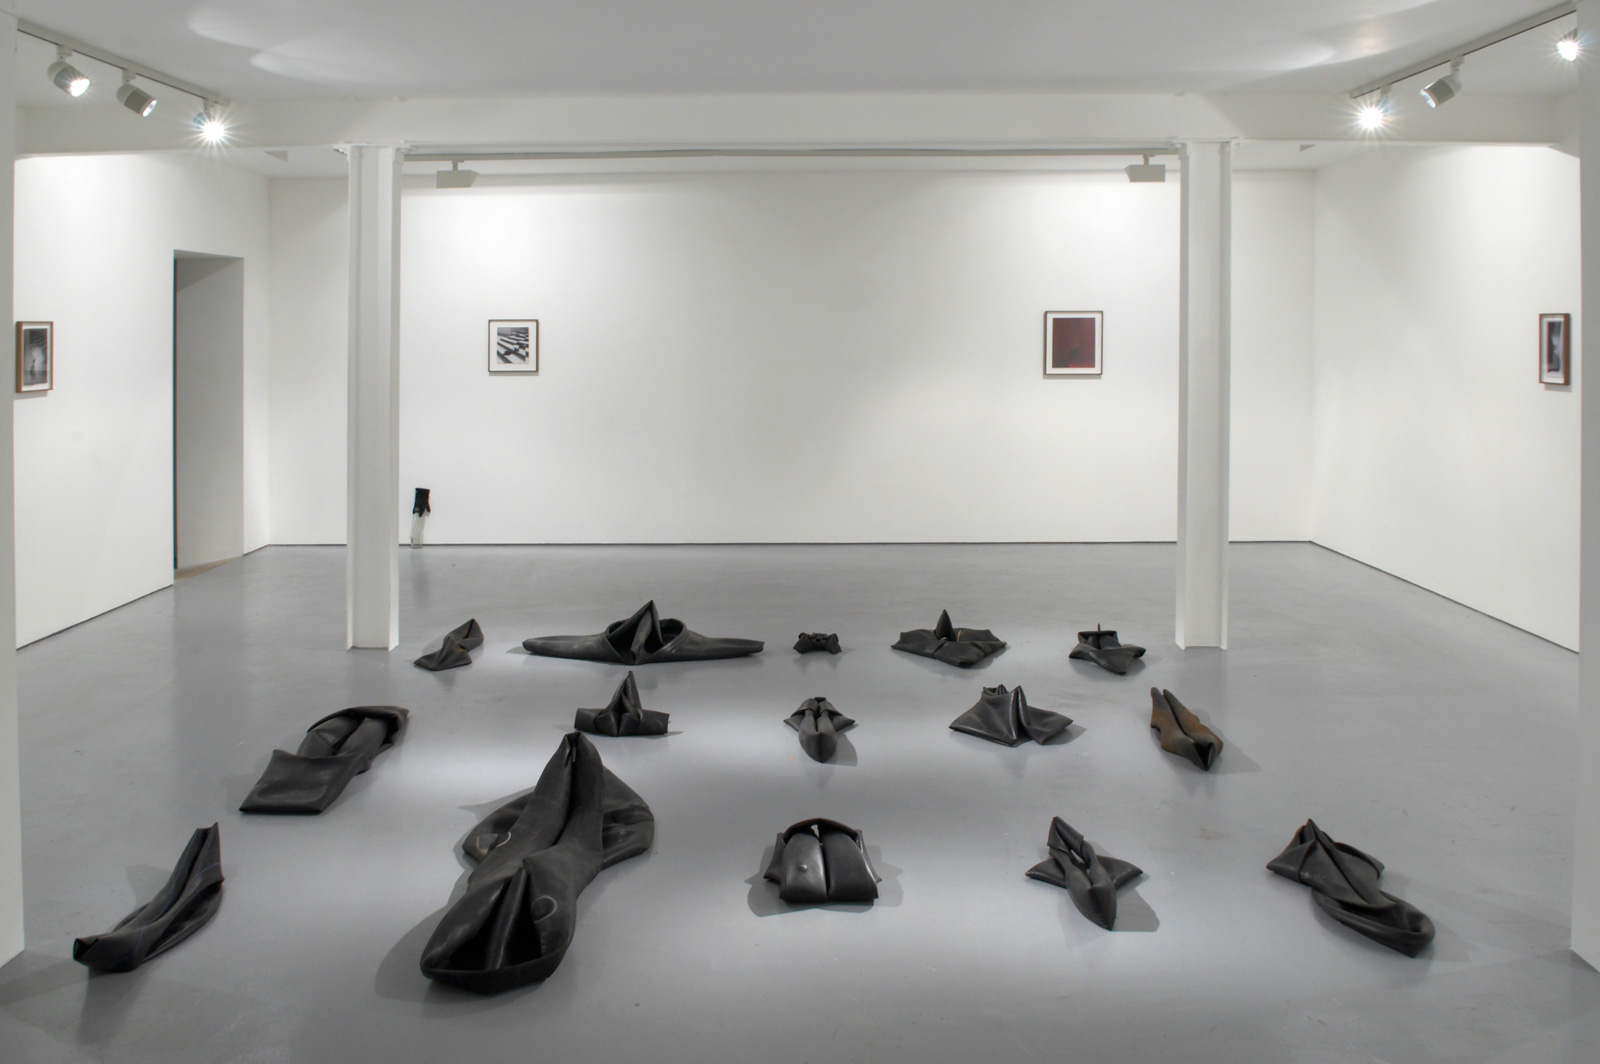 Installation view. In Apertura , Martin Soto Climent, Raphael Danke, Jennifer West